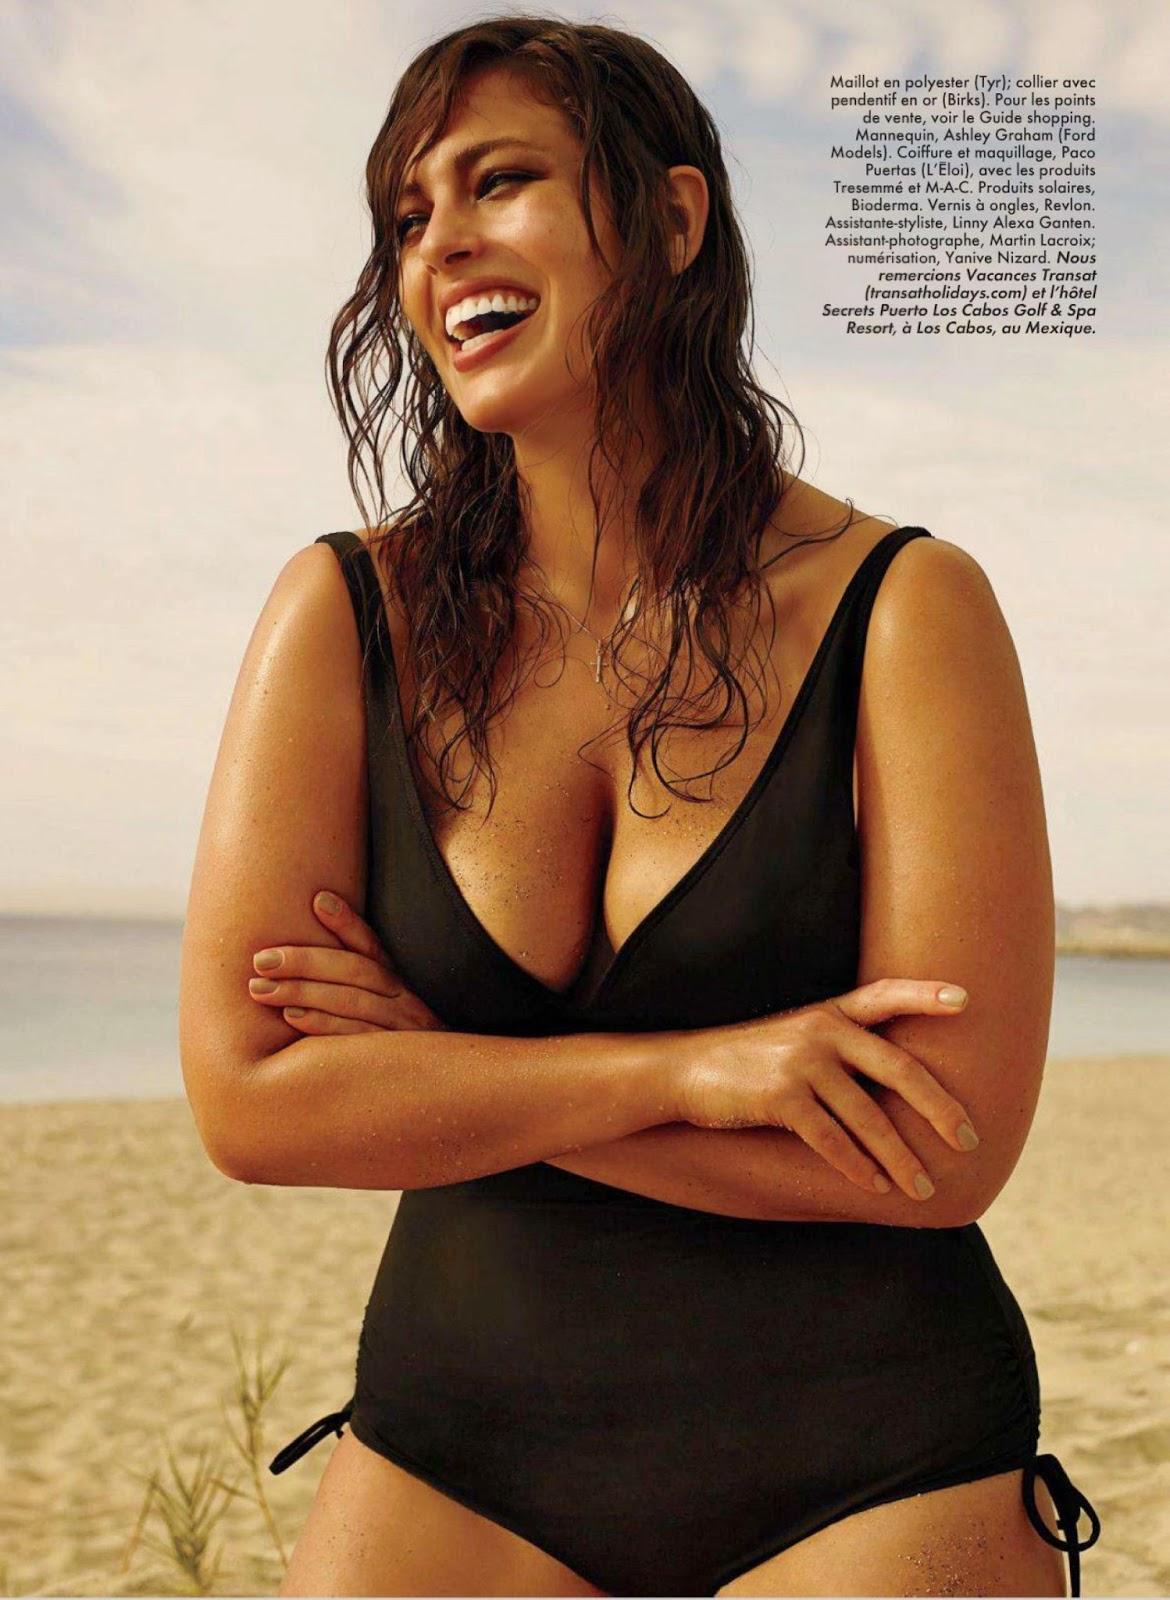 Ashley Graham For ELLE Quebec Magazine, June 2014